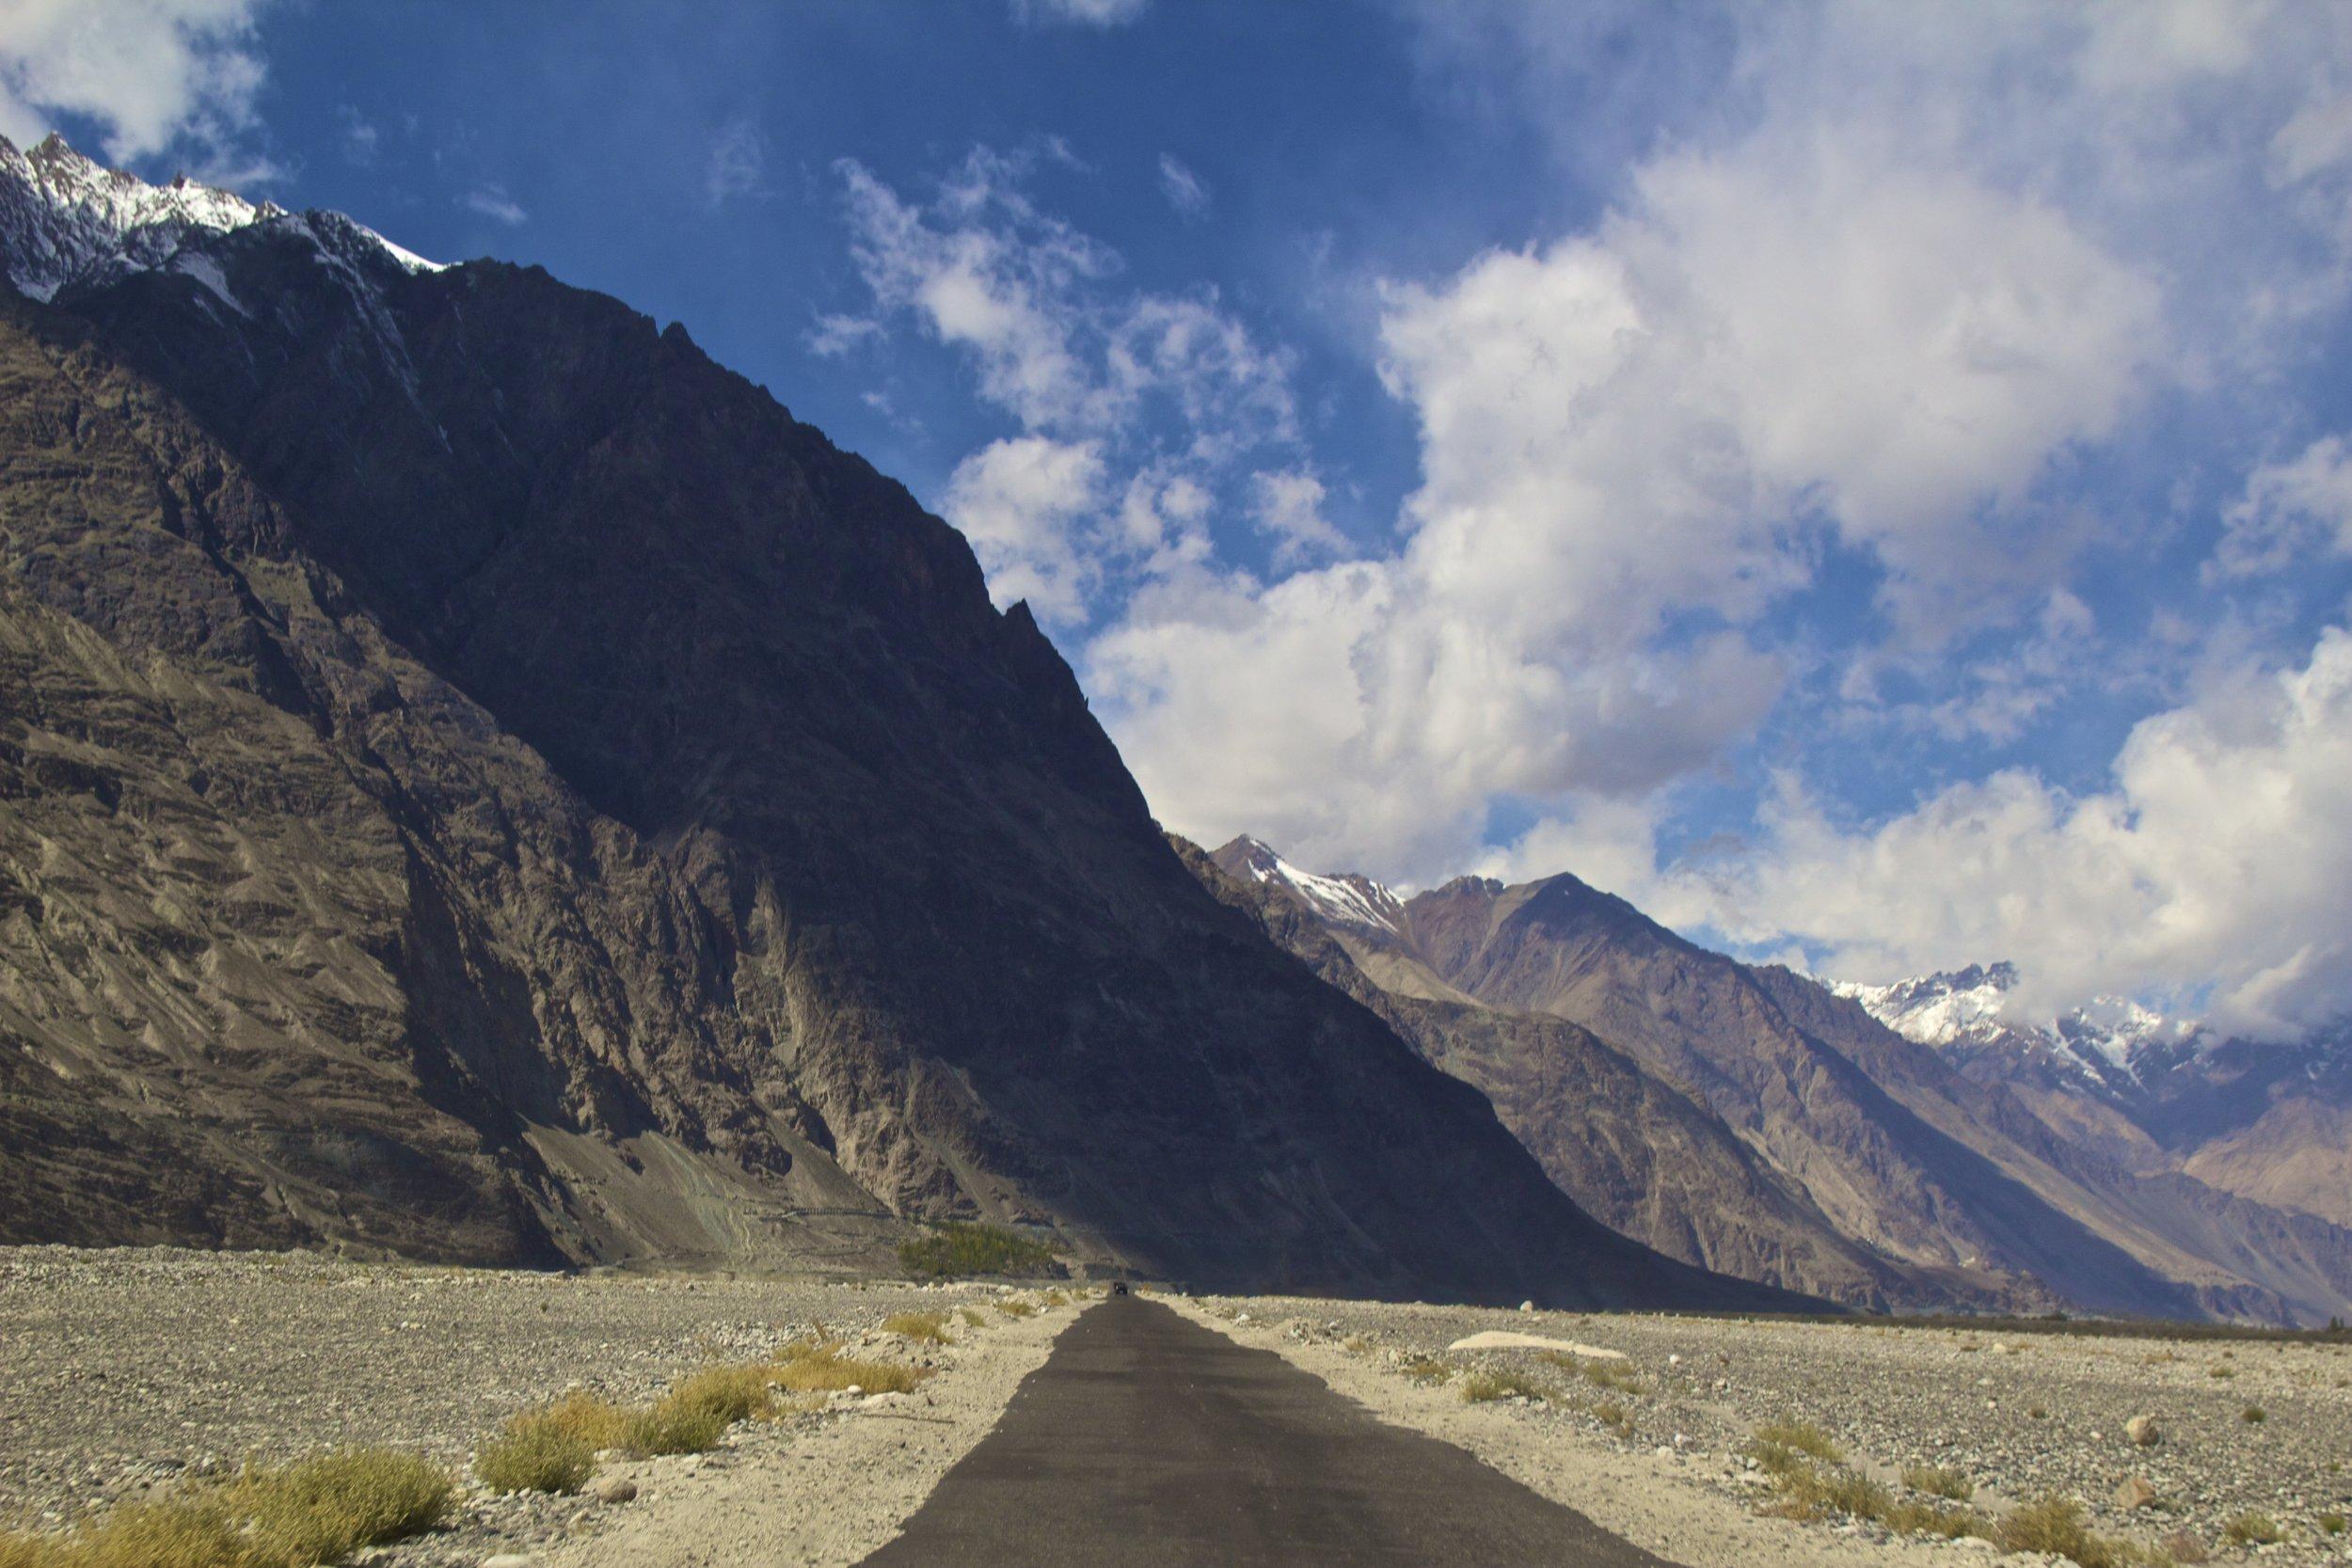 Nubra Valley Ladakh Kashmir Indian Himalayas Roads 4.jpg